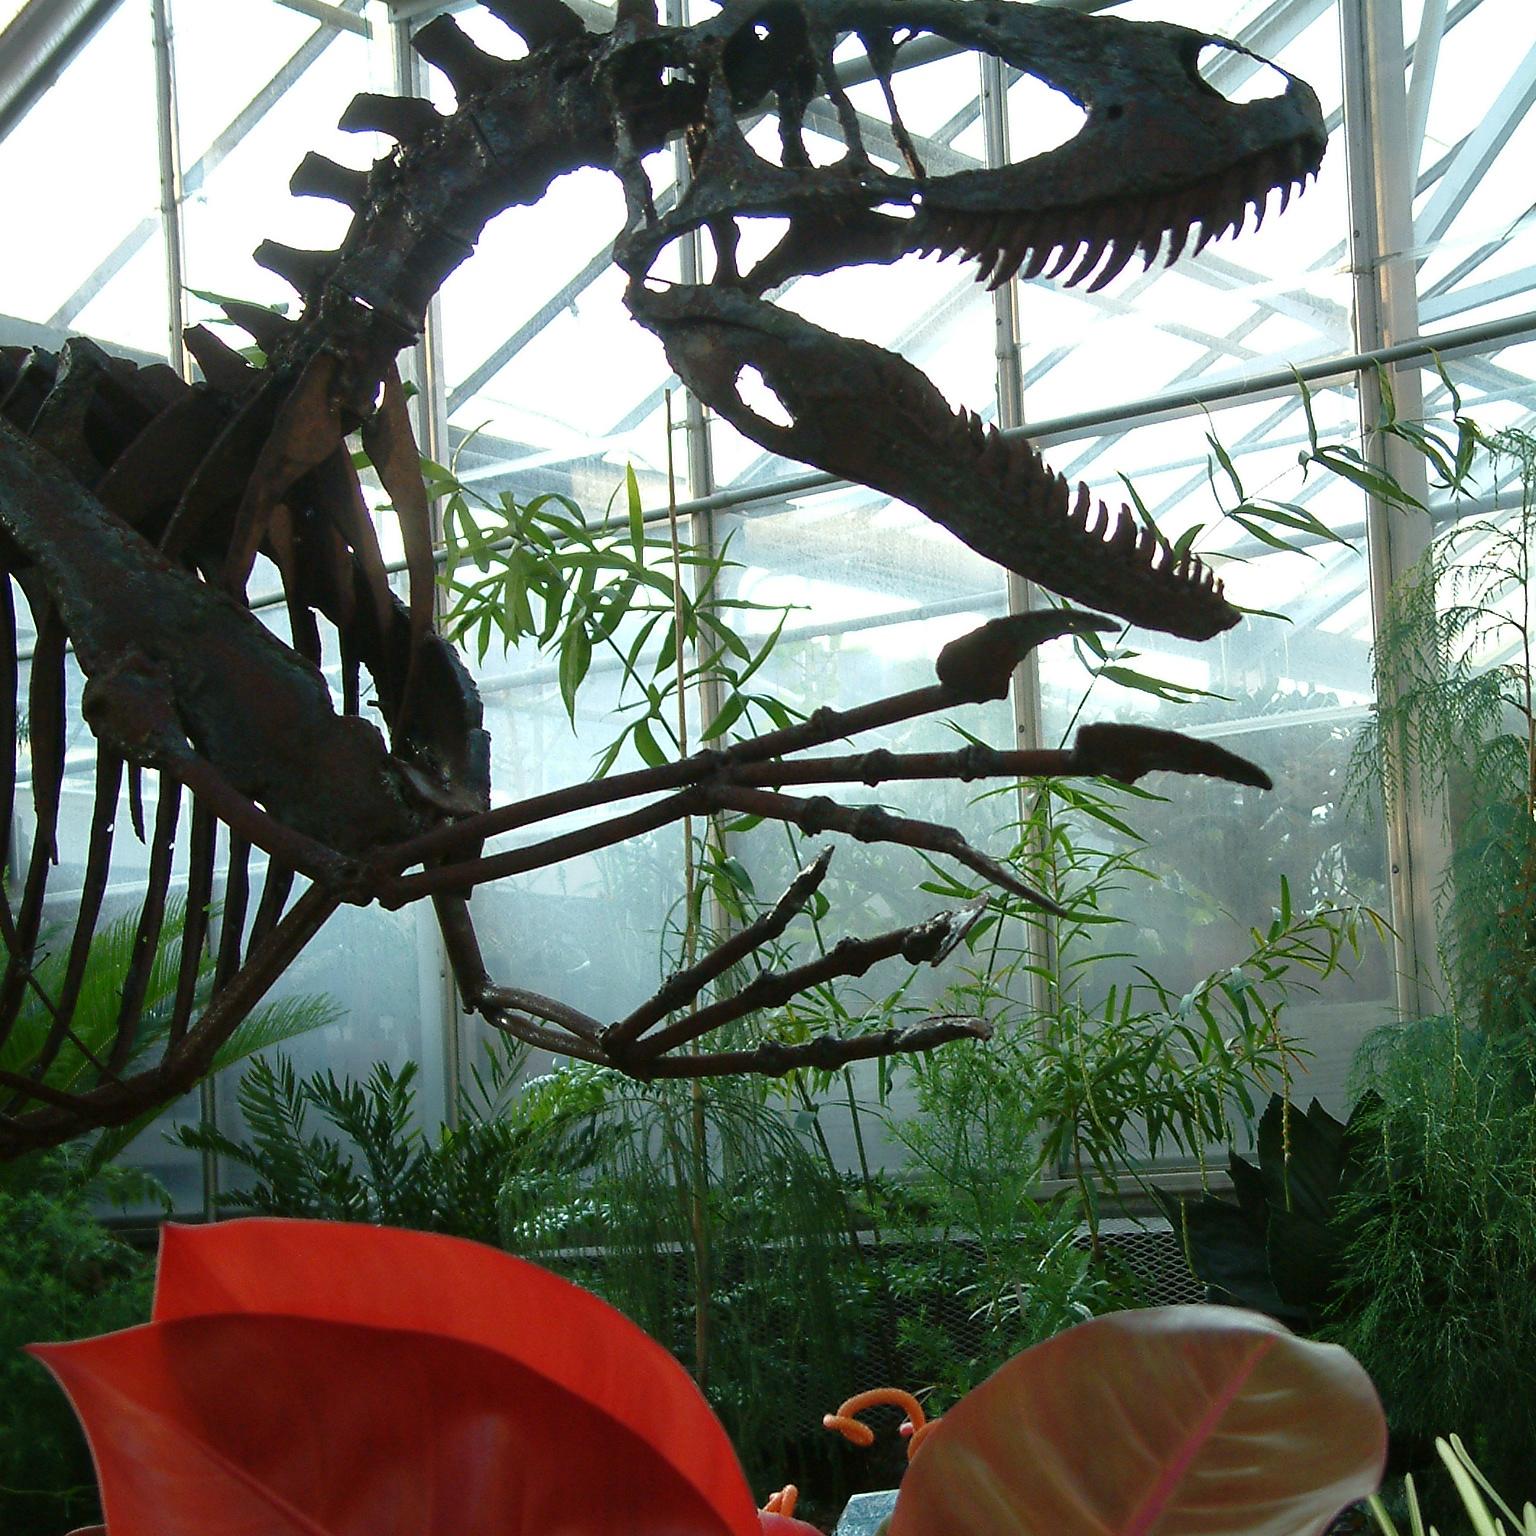 Genial Square Dinosauru0027s Garden At McMillan Greenhouse   TLM